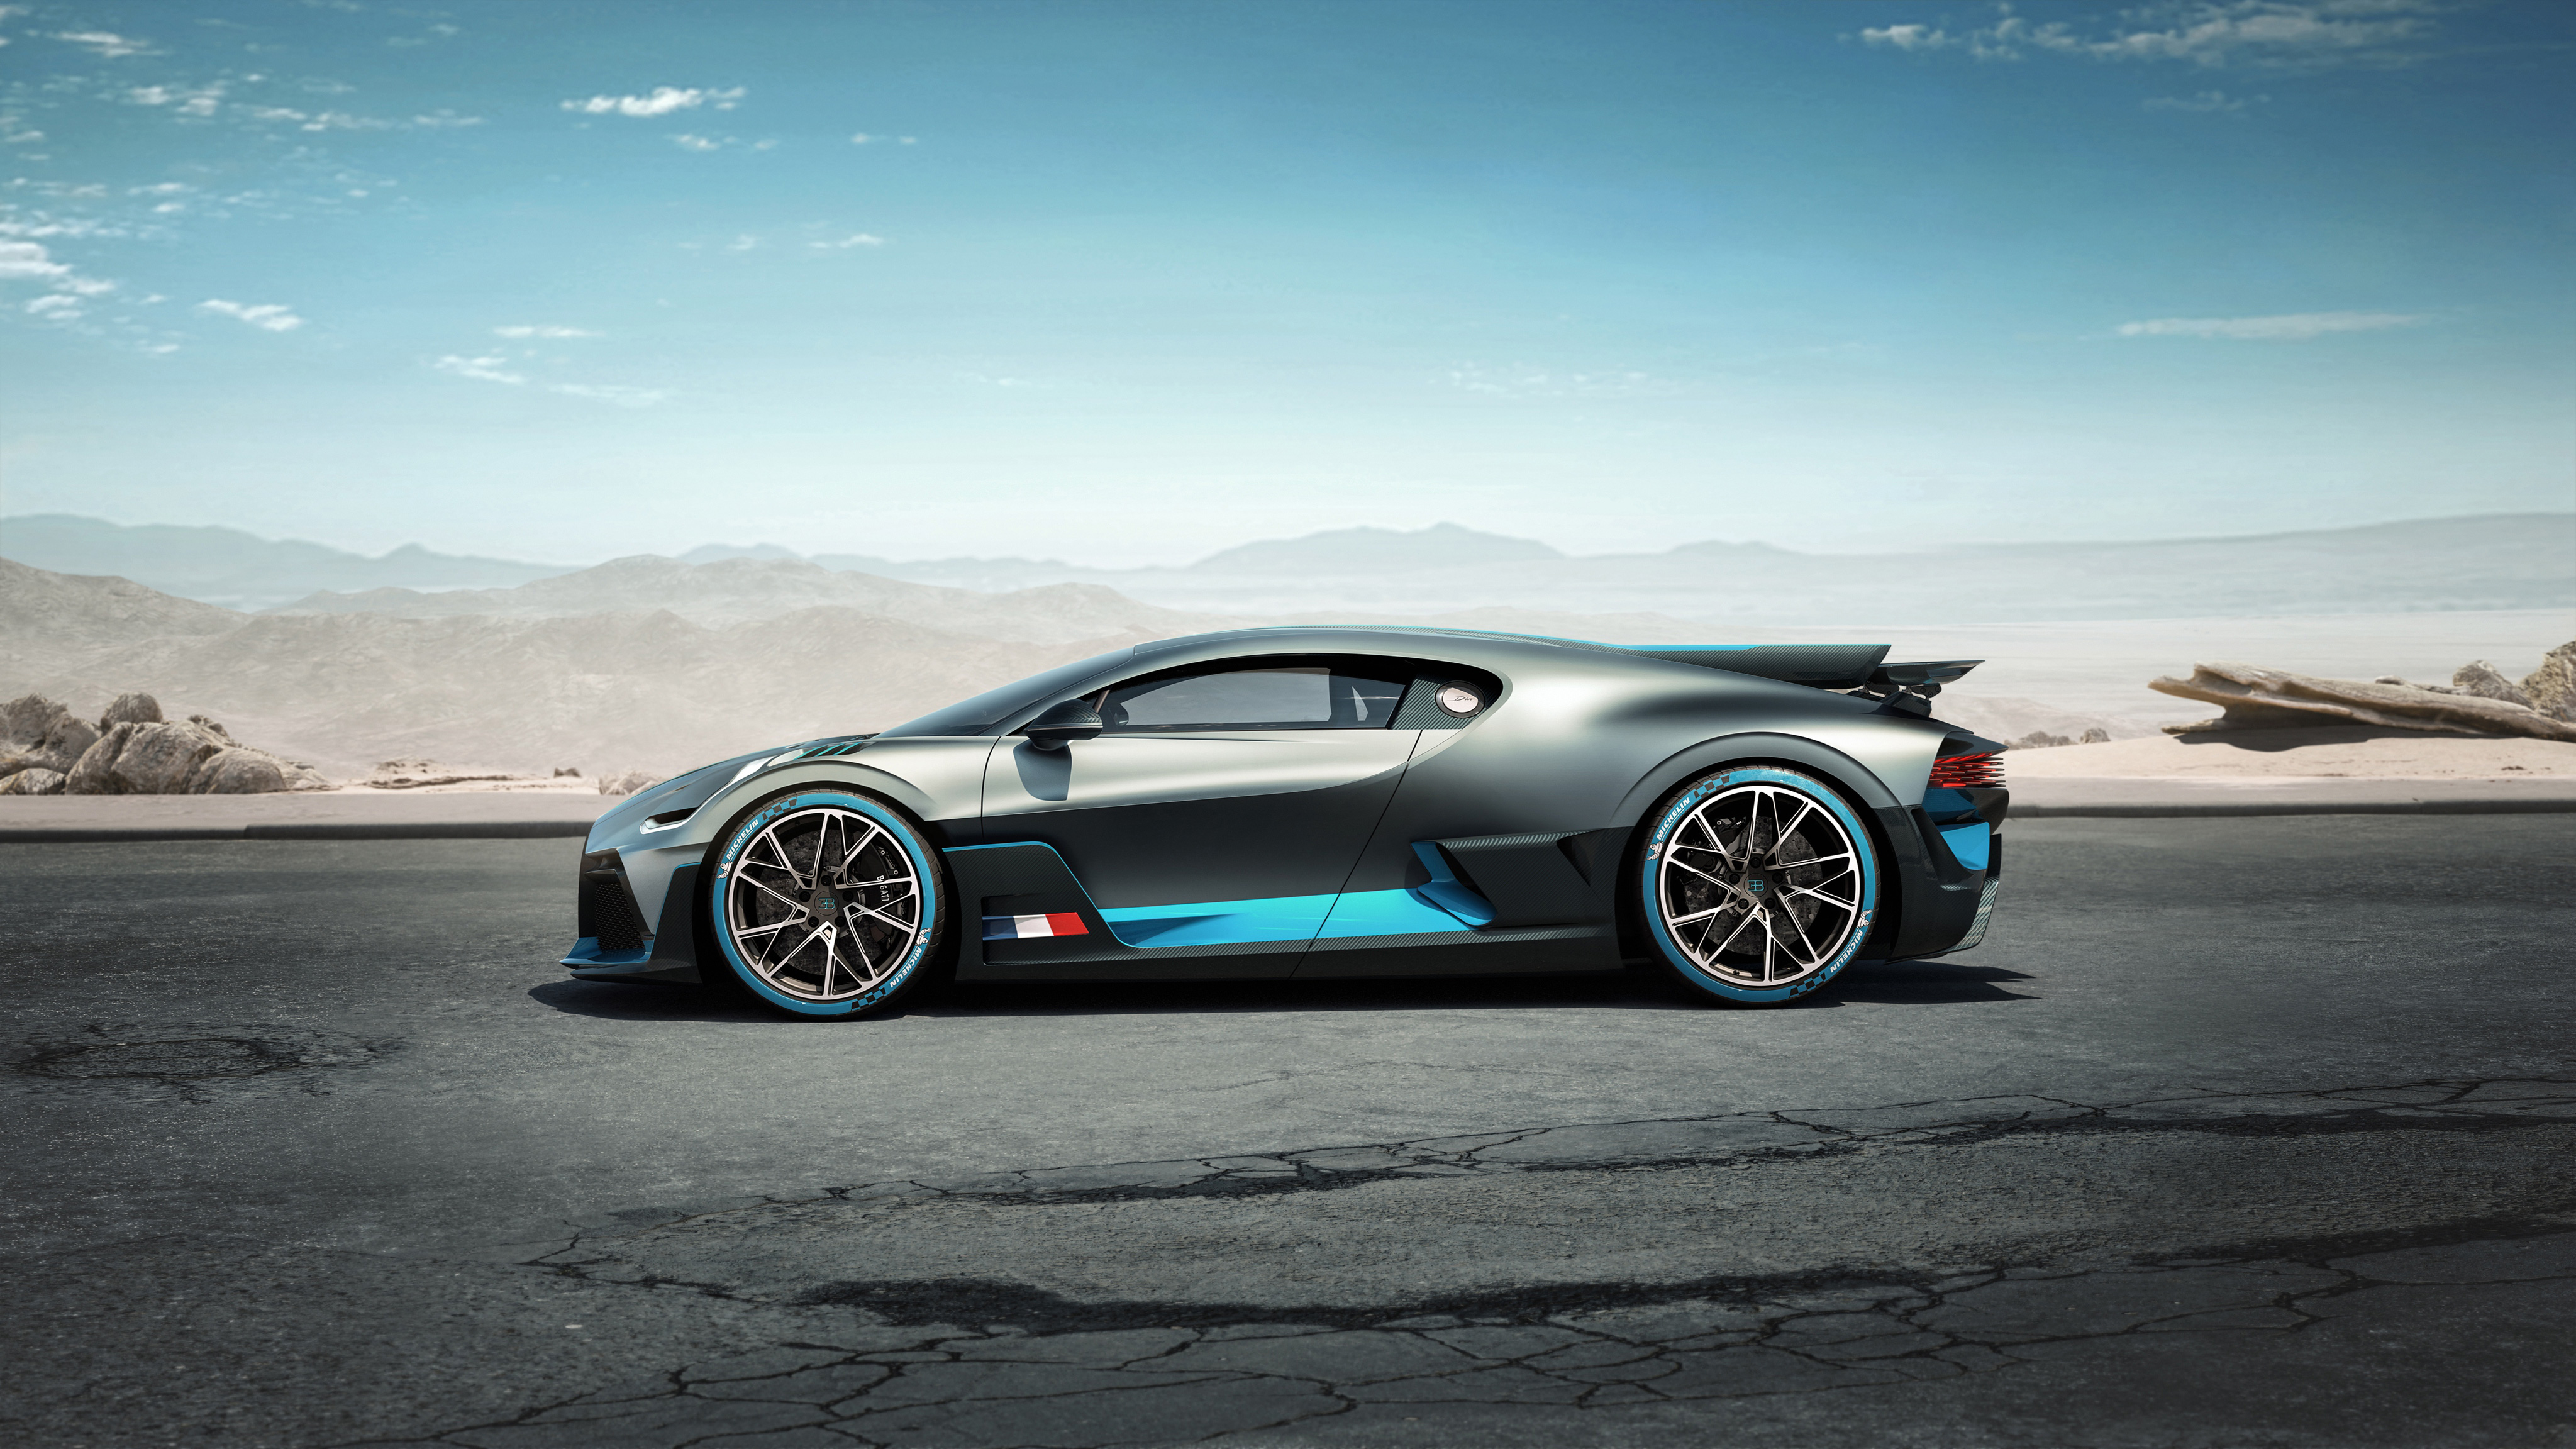 2018 Bugatti Divo 4k, HD Cars, 4k Wallpapers, Images ...